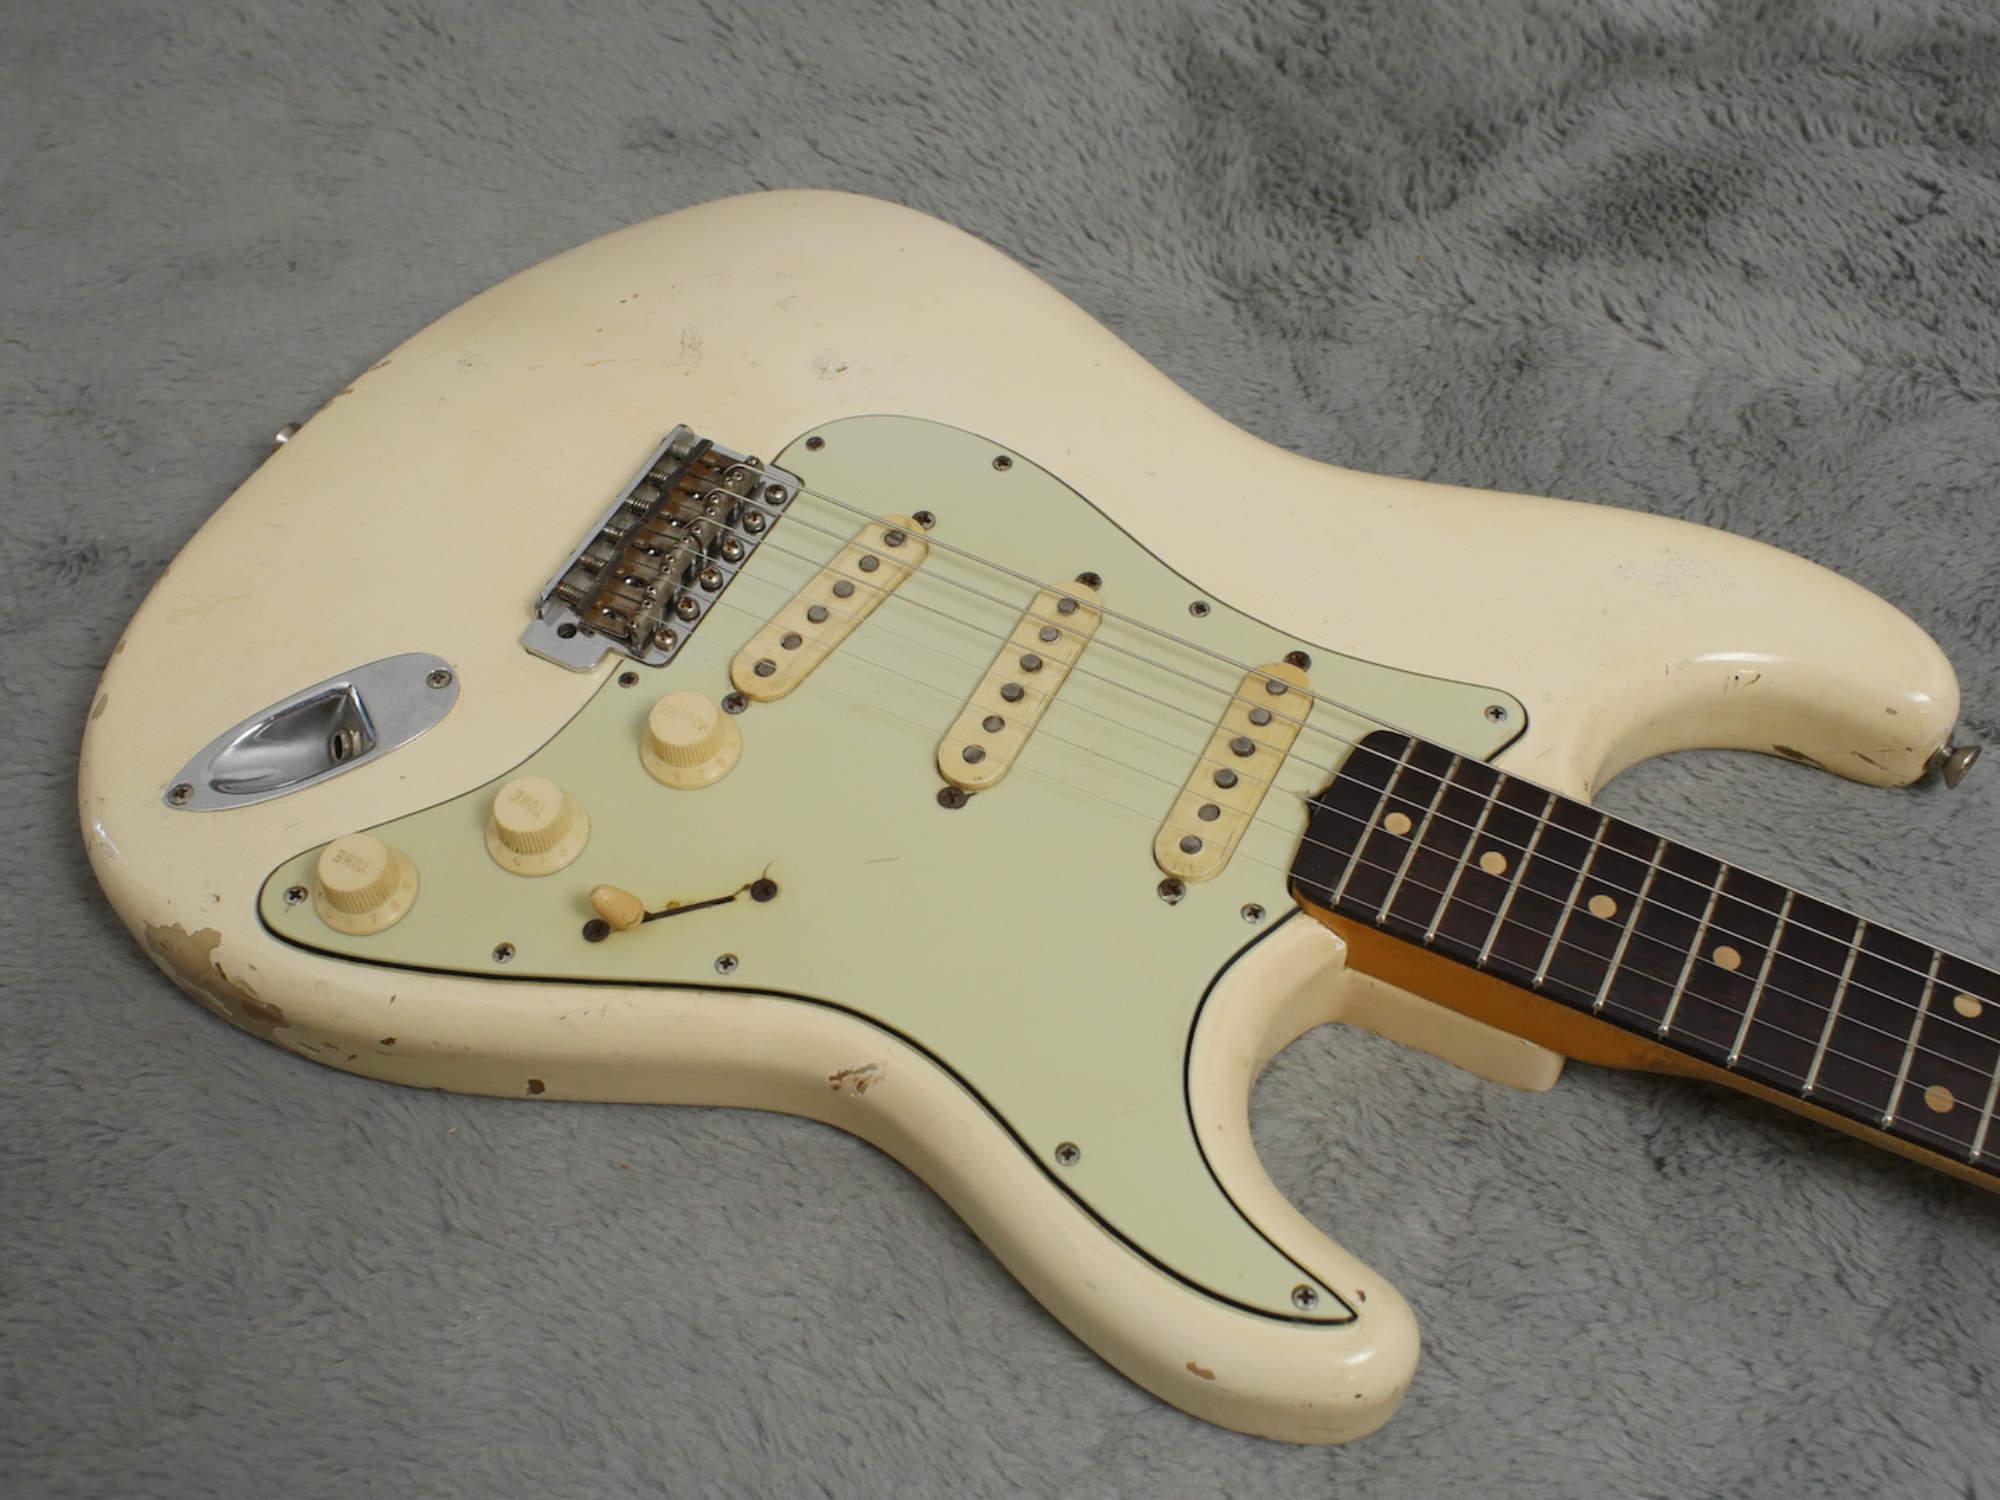 1963 Fender Stratocaster | Garys Classic Guitars & Vintage Guitars LLC